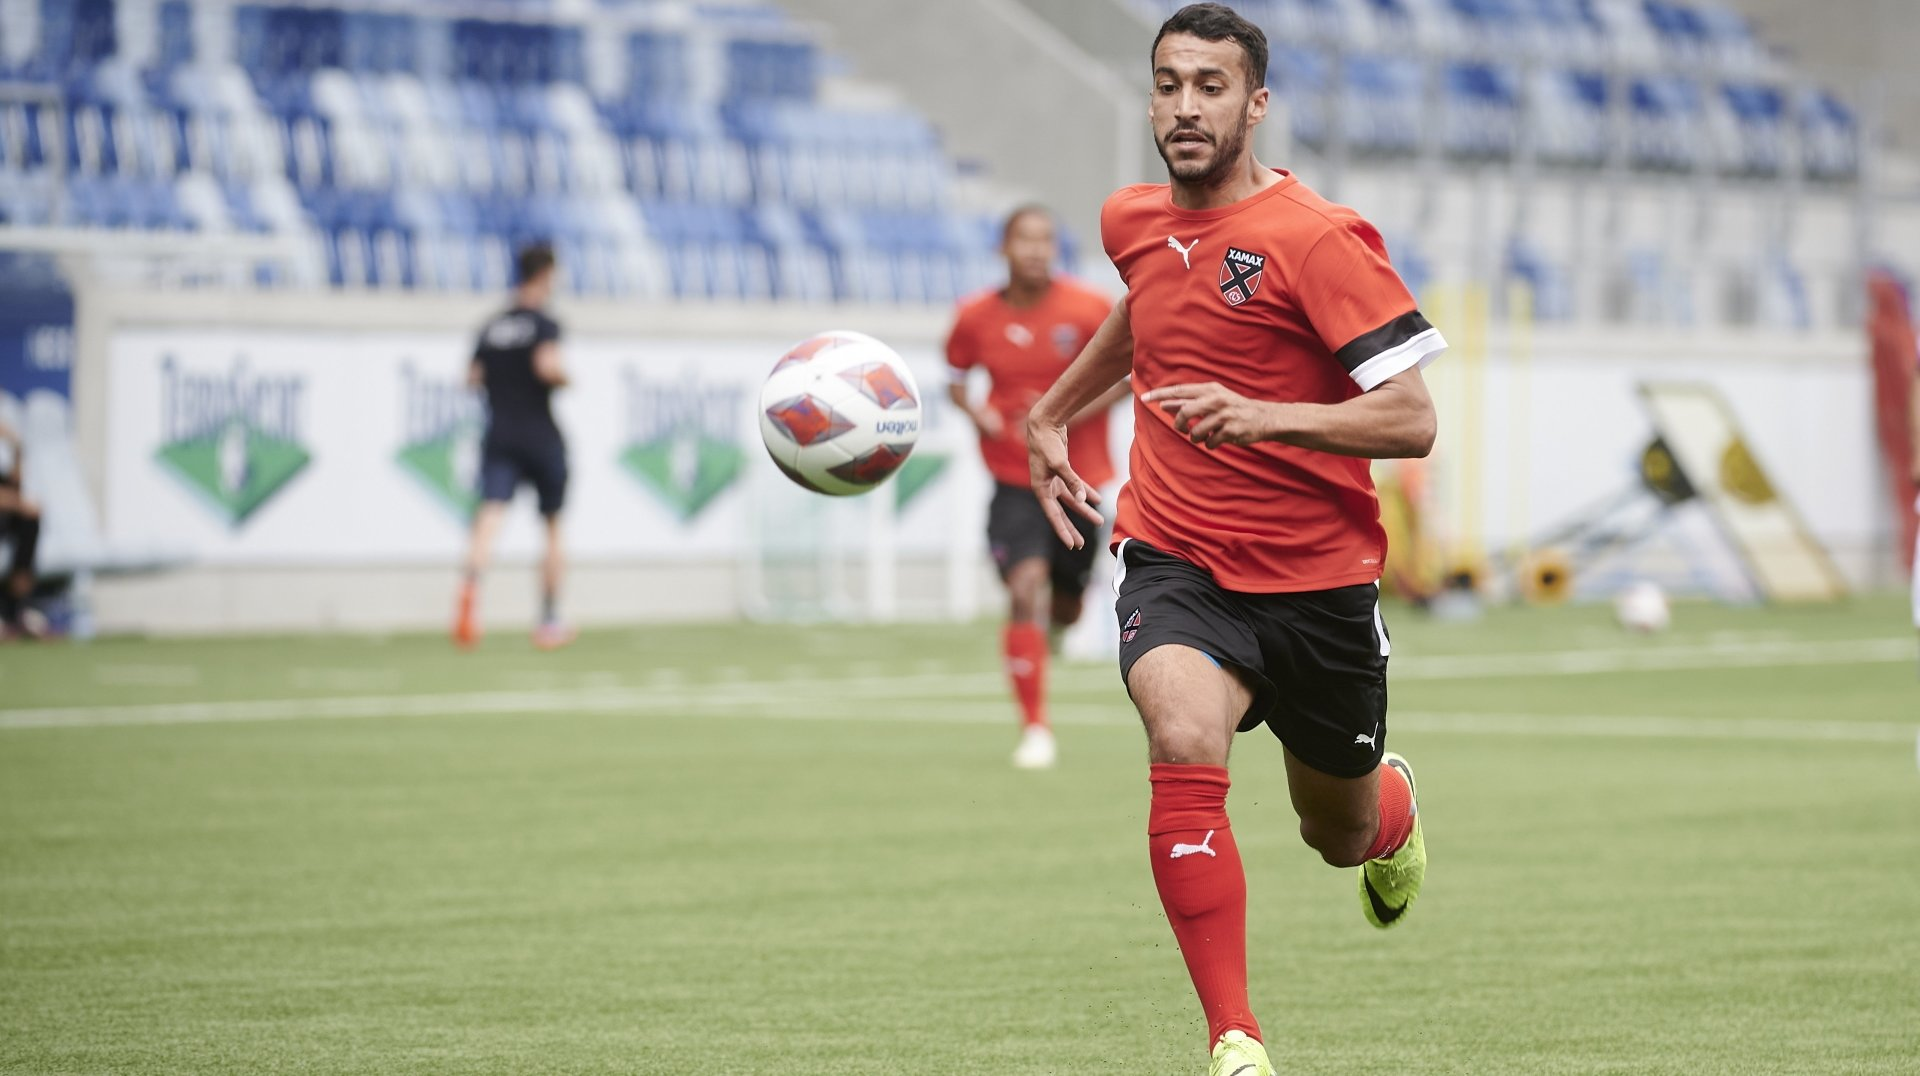 Football: grave blessure pour le Xamaxien Ayoub Ouhafsa